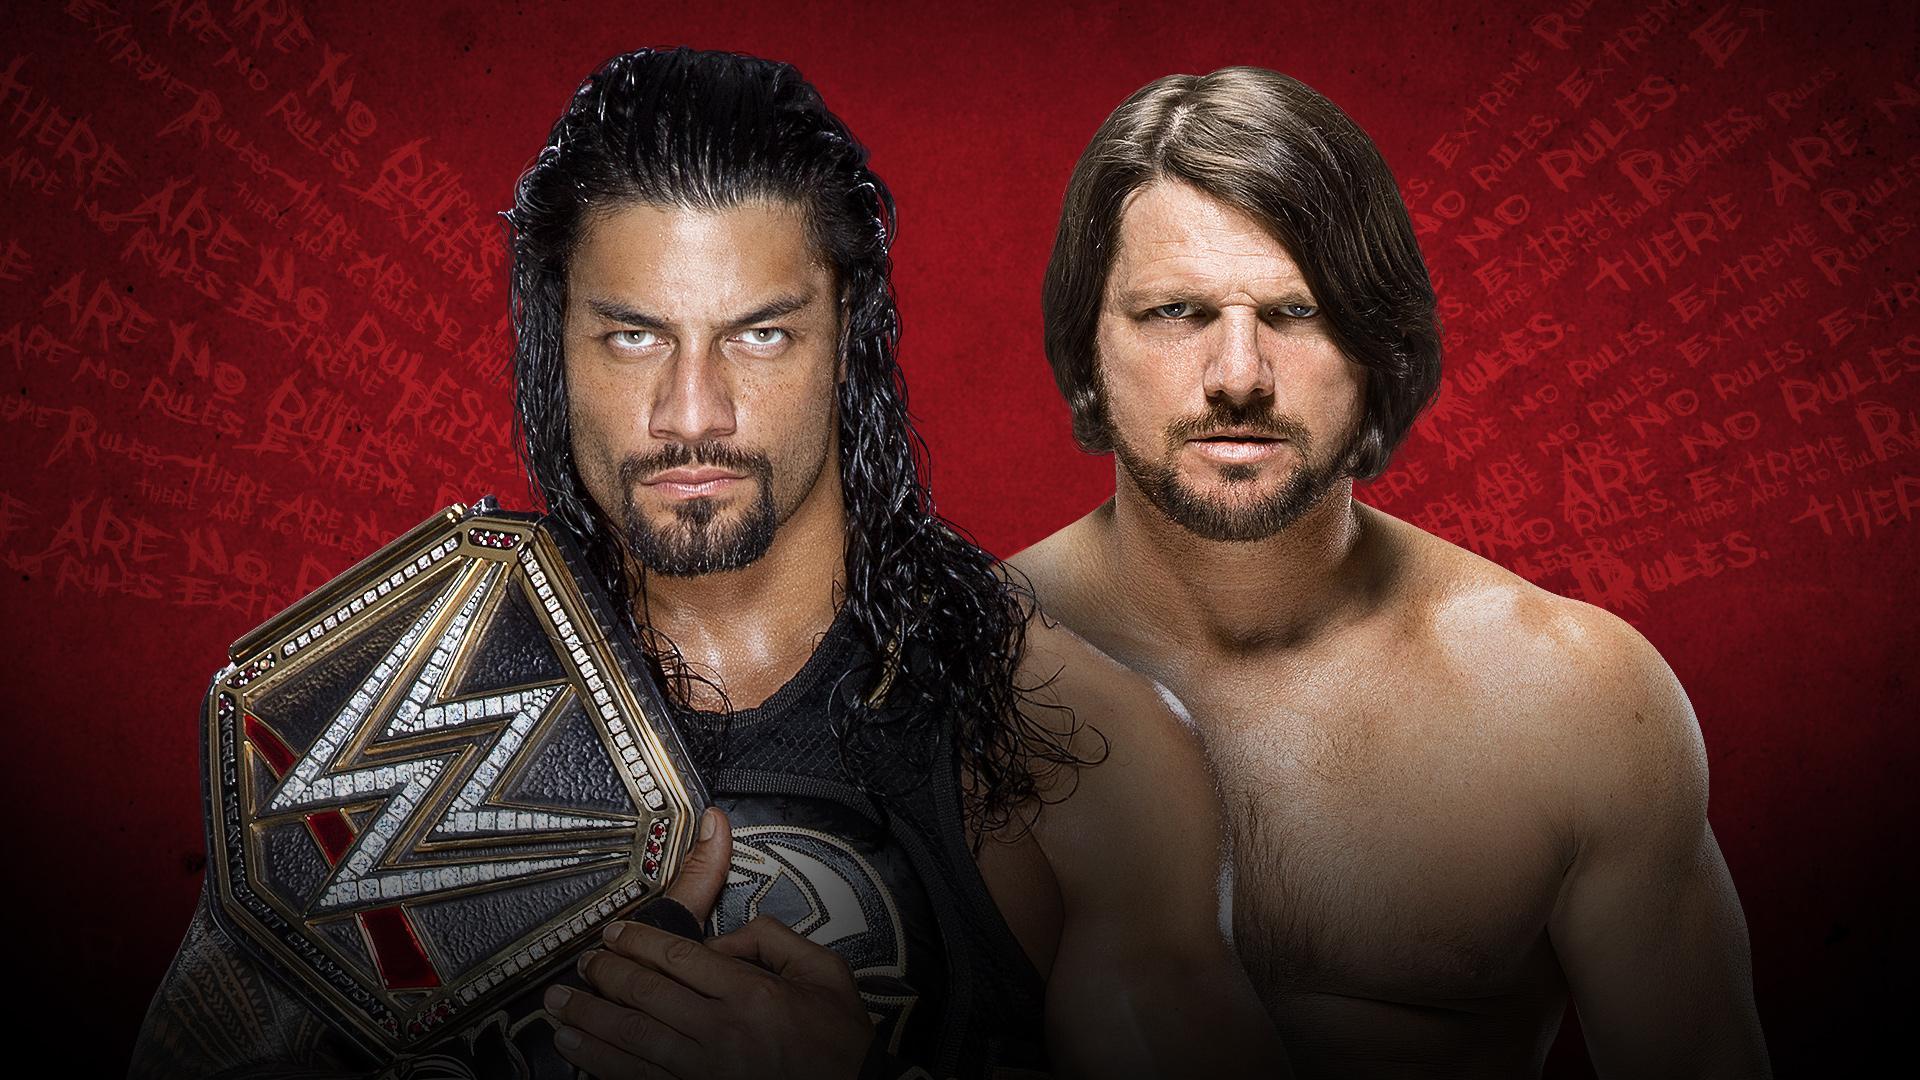 Roman Reigns vs. AJ Styles | Credit: WWE